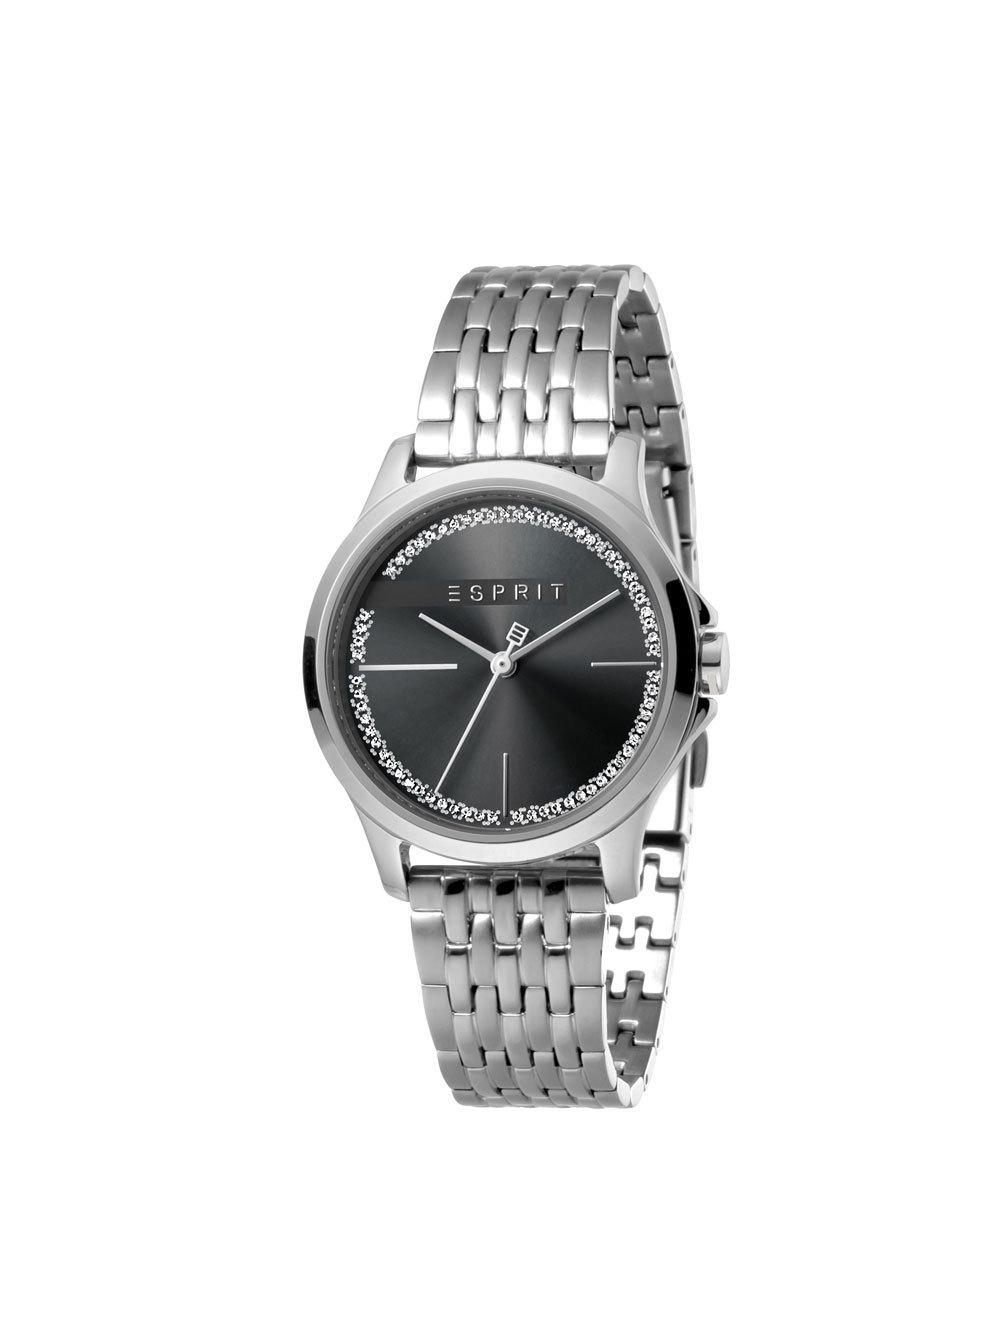 Esprit ES1L028M0065 Joy Black Silverplated MB. horloge